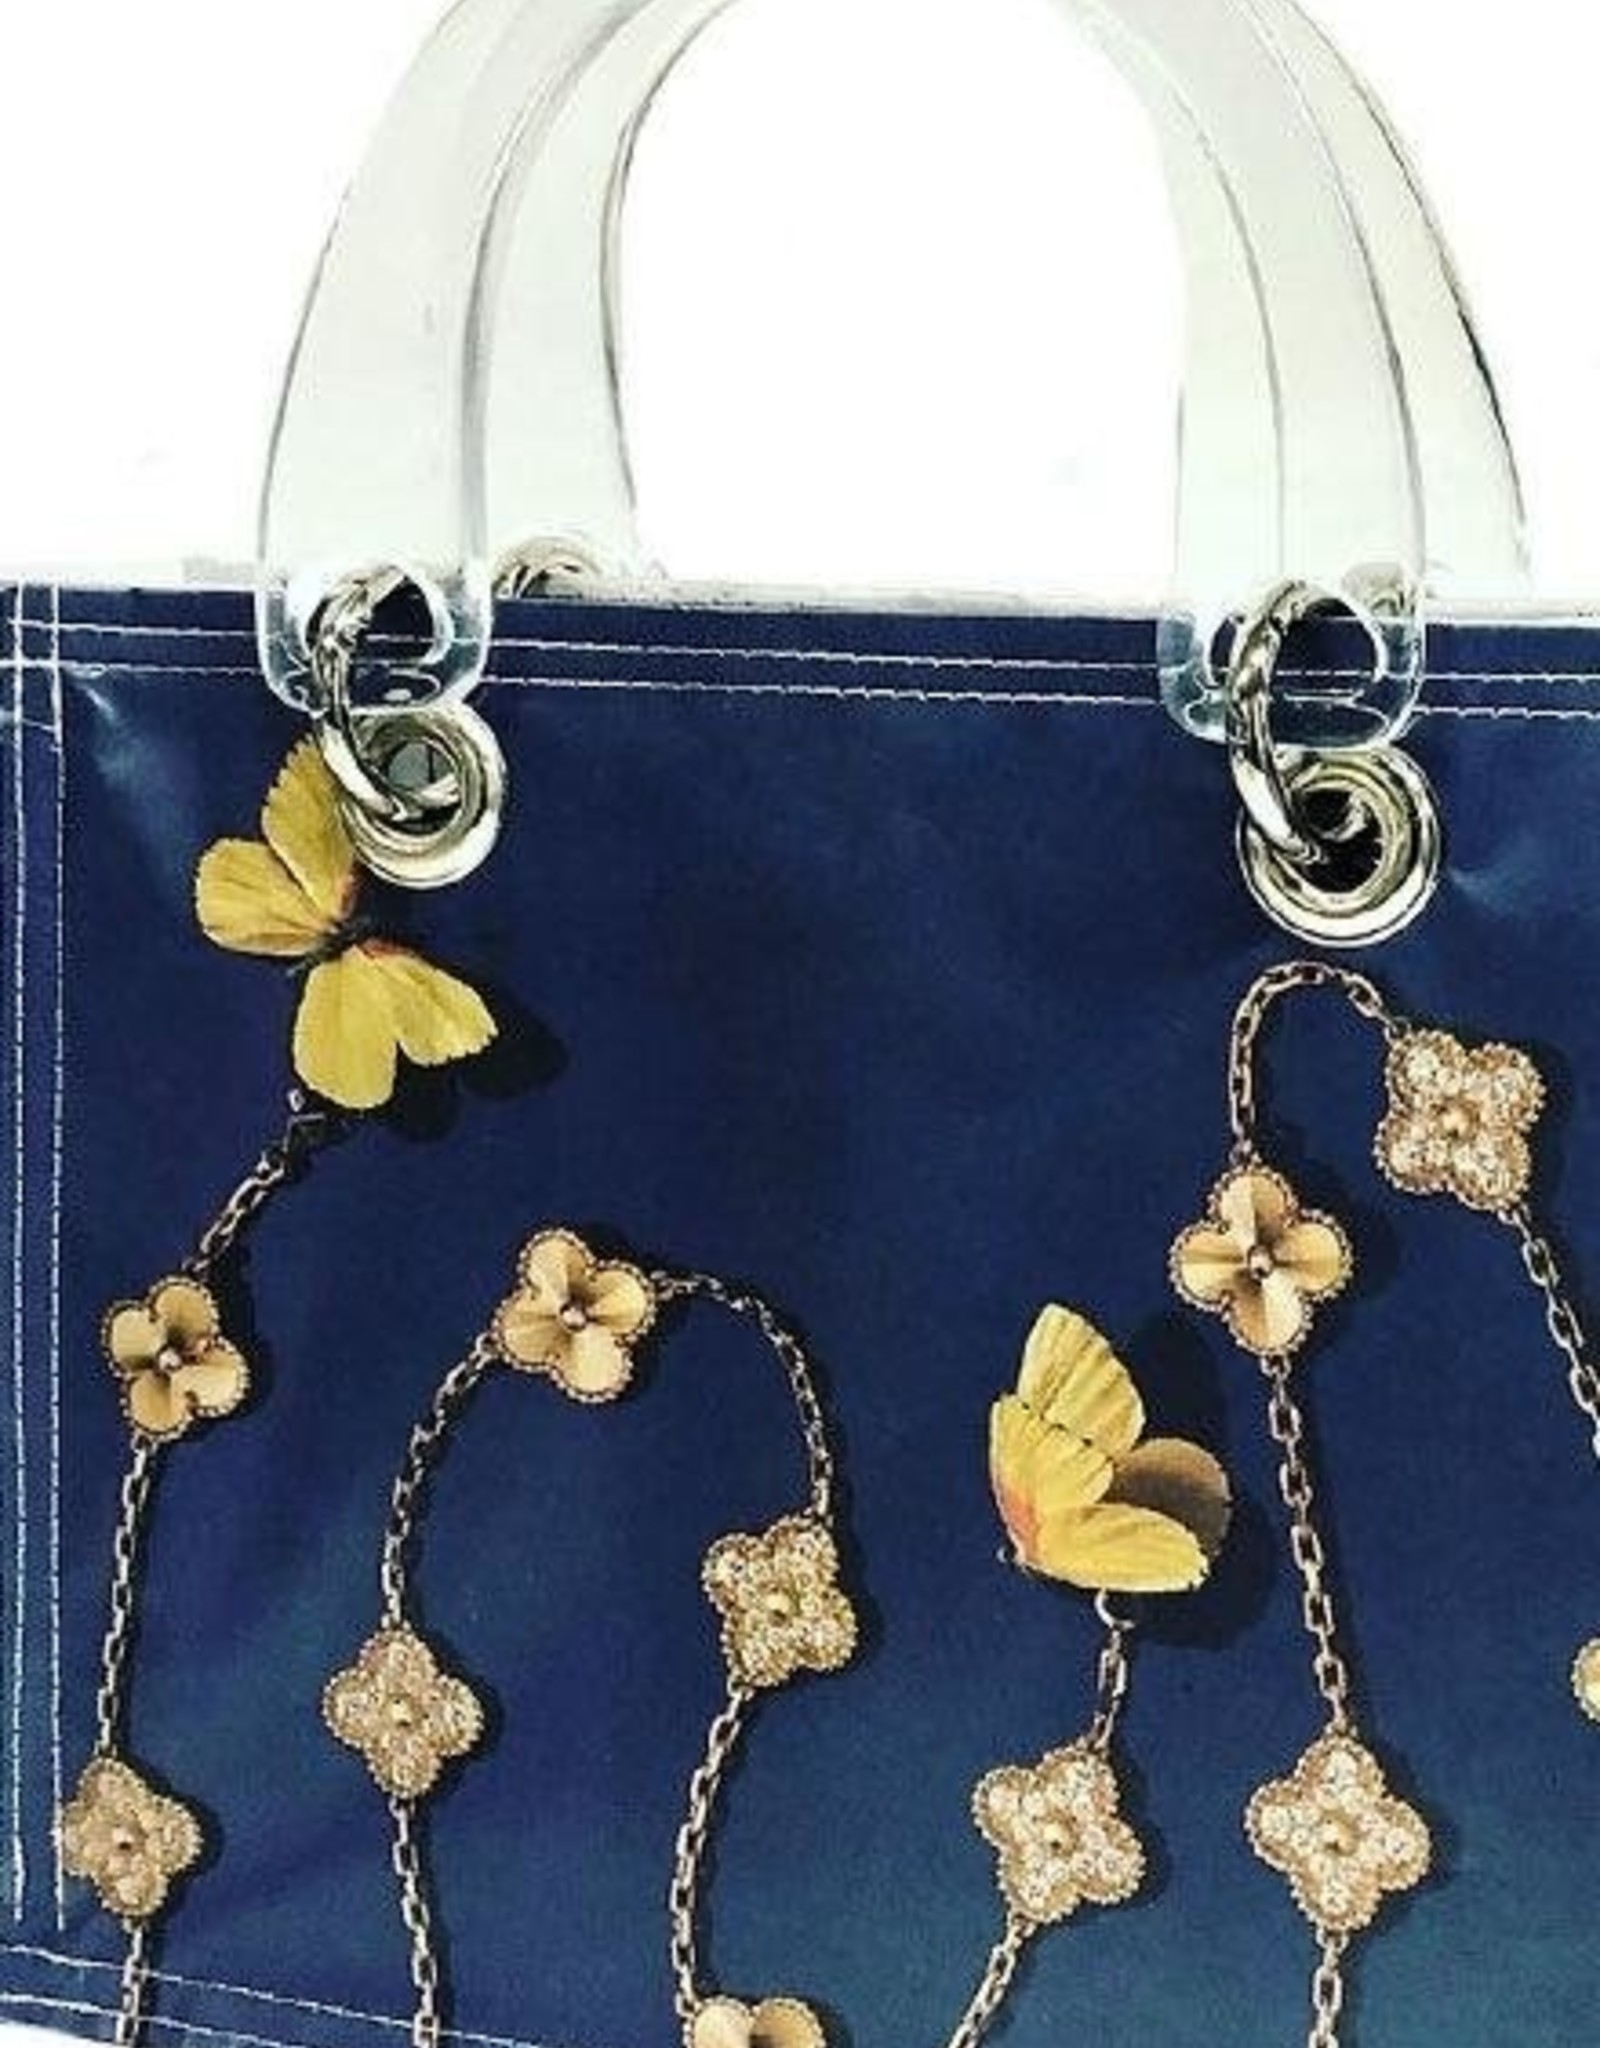 Couture Planet Coco Van Cleef Bag